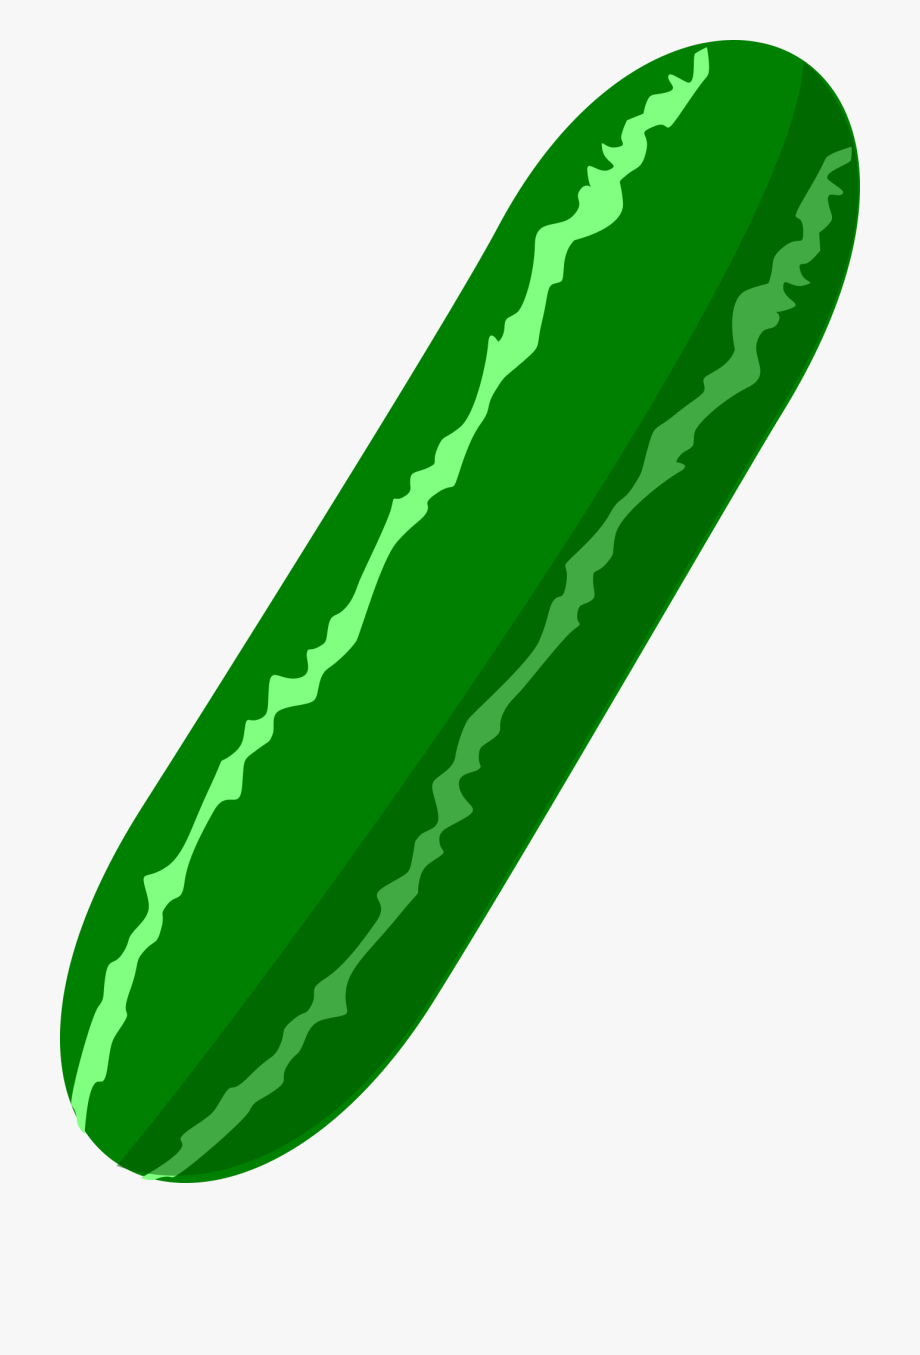 Pickled Cucumber Tattoo Clip Art Vegetable Pickling.